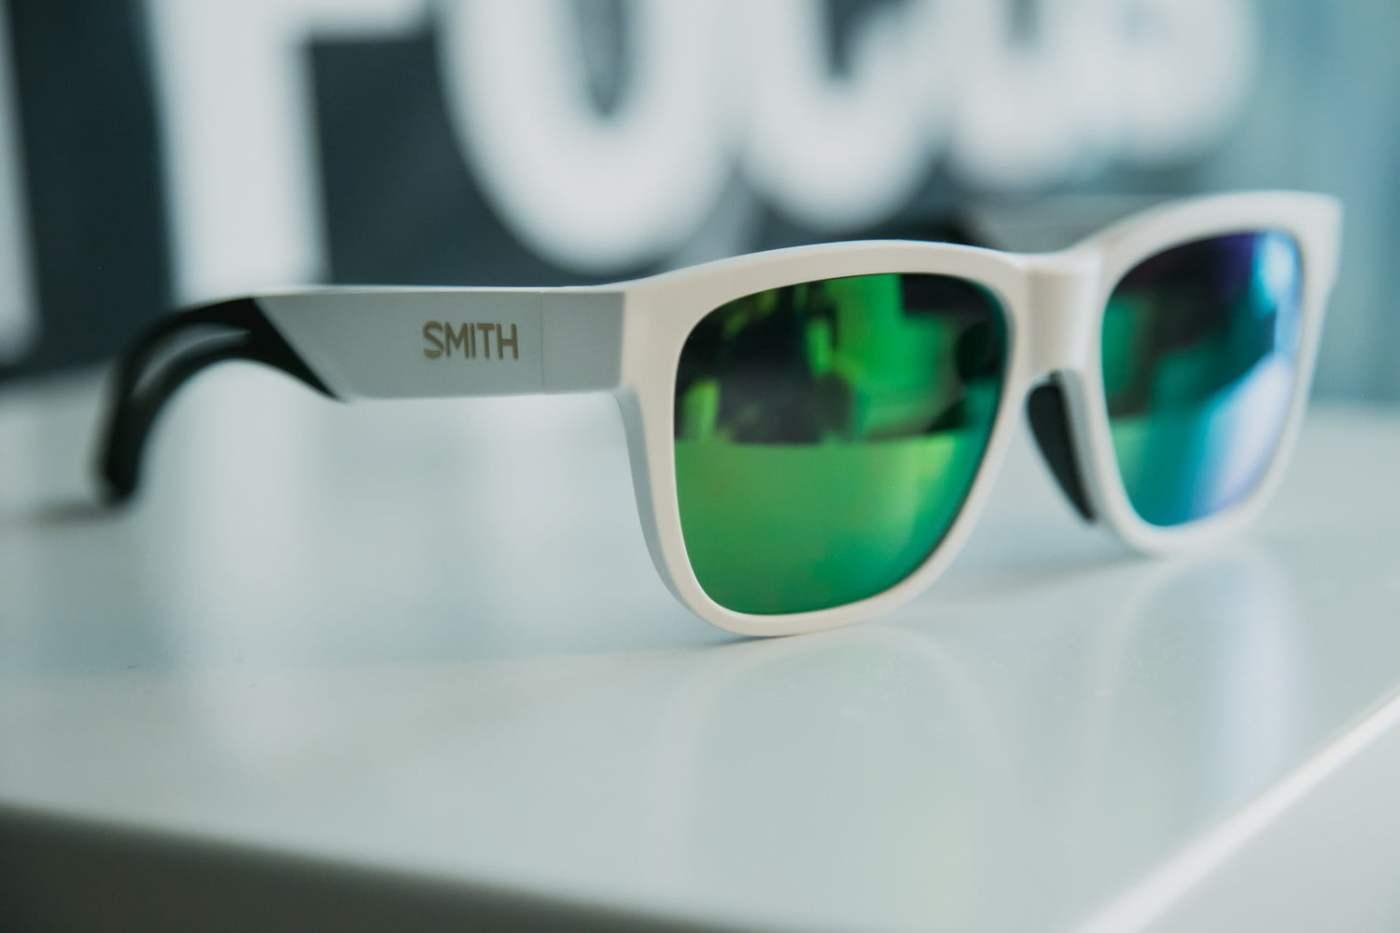 Smith Sunglasses White